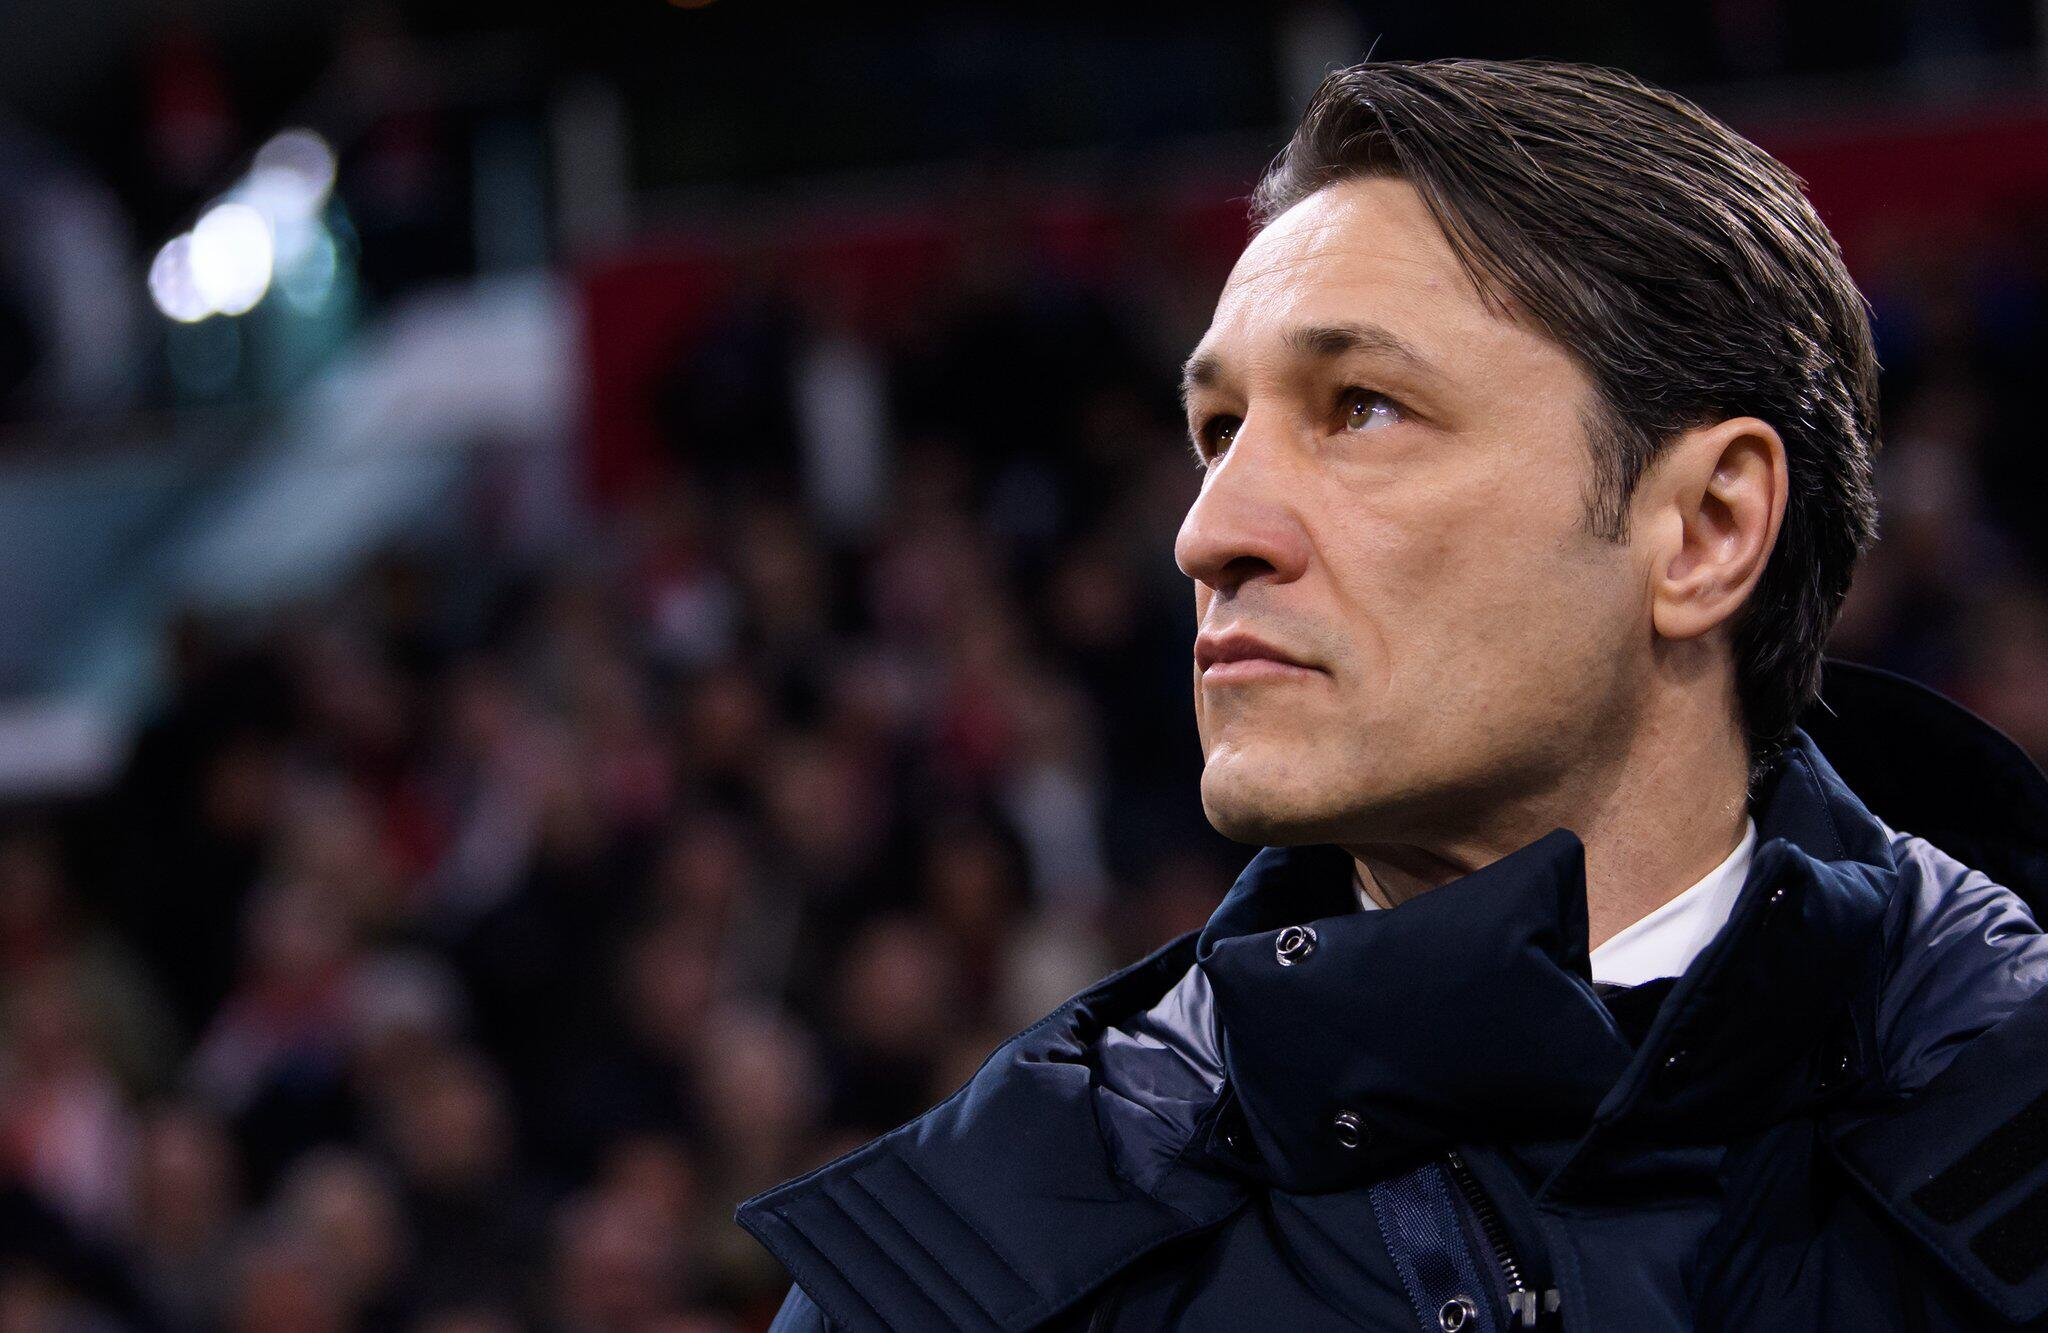 Bild zu Champions League, Ajax Amsterdam - Bayern München, Niko Kovac